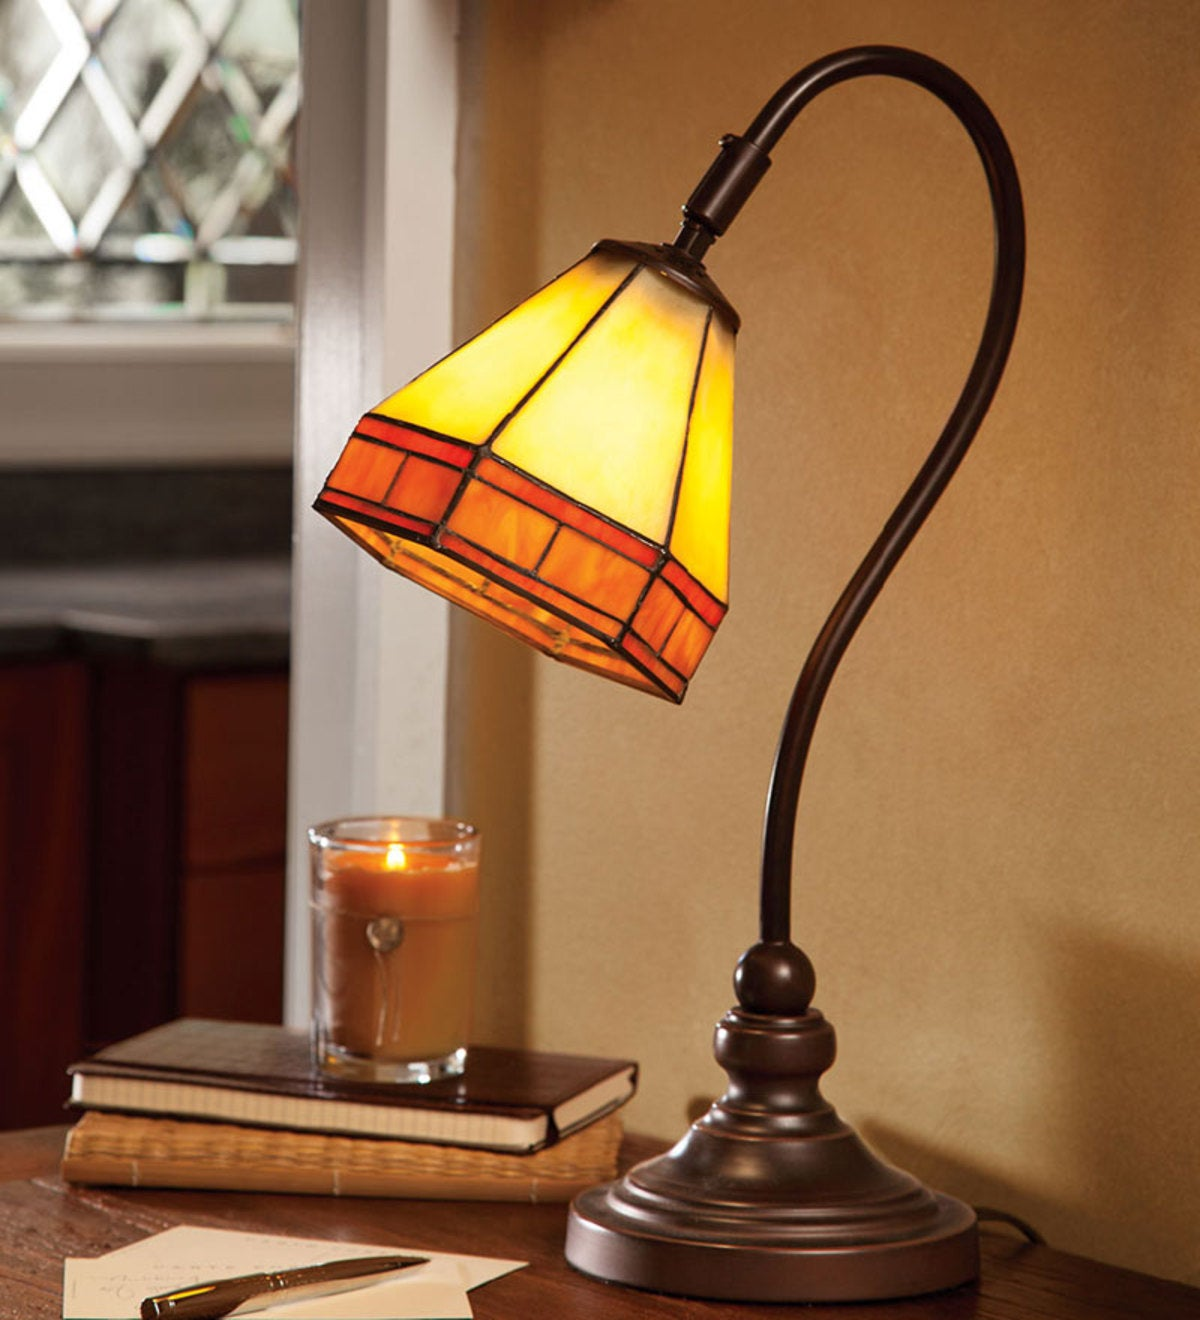 TIFFANY STYLE DESK LAMP IN CUSTOMER'S SATISFACTION DECORATION